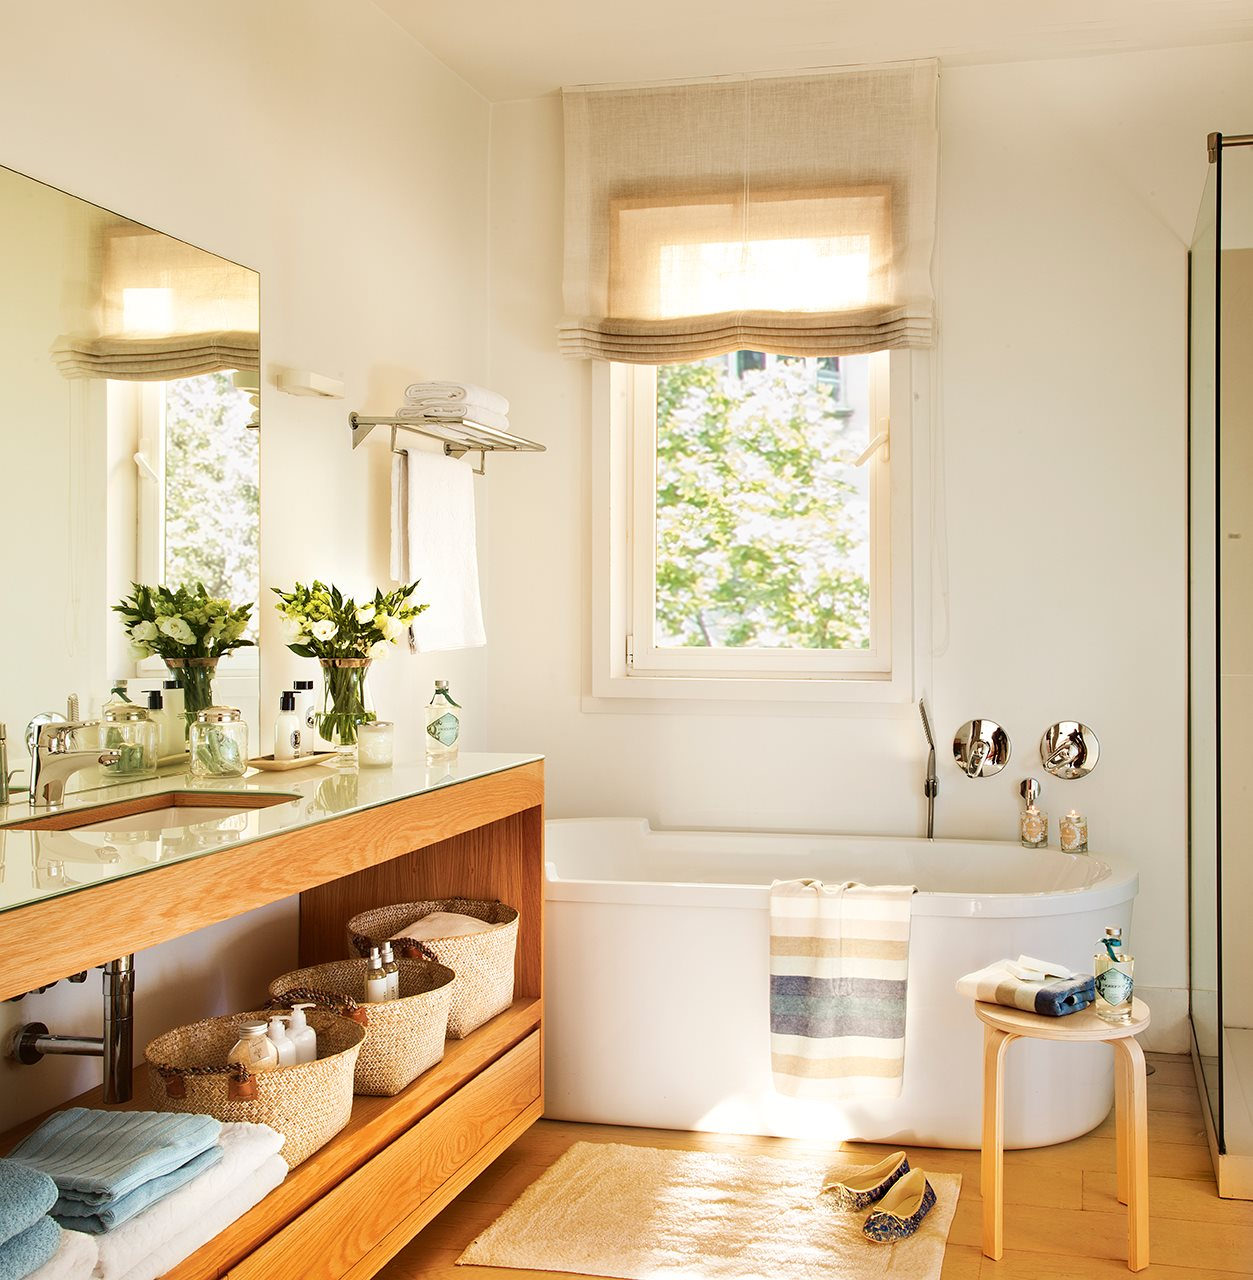 Un ba o con ba era ducha y un vestidor for Banos pequenos con banera